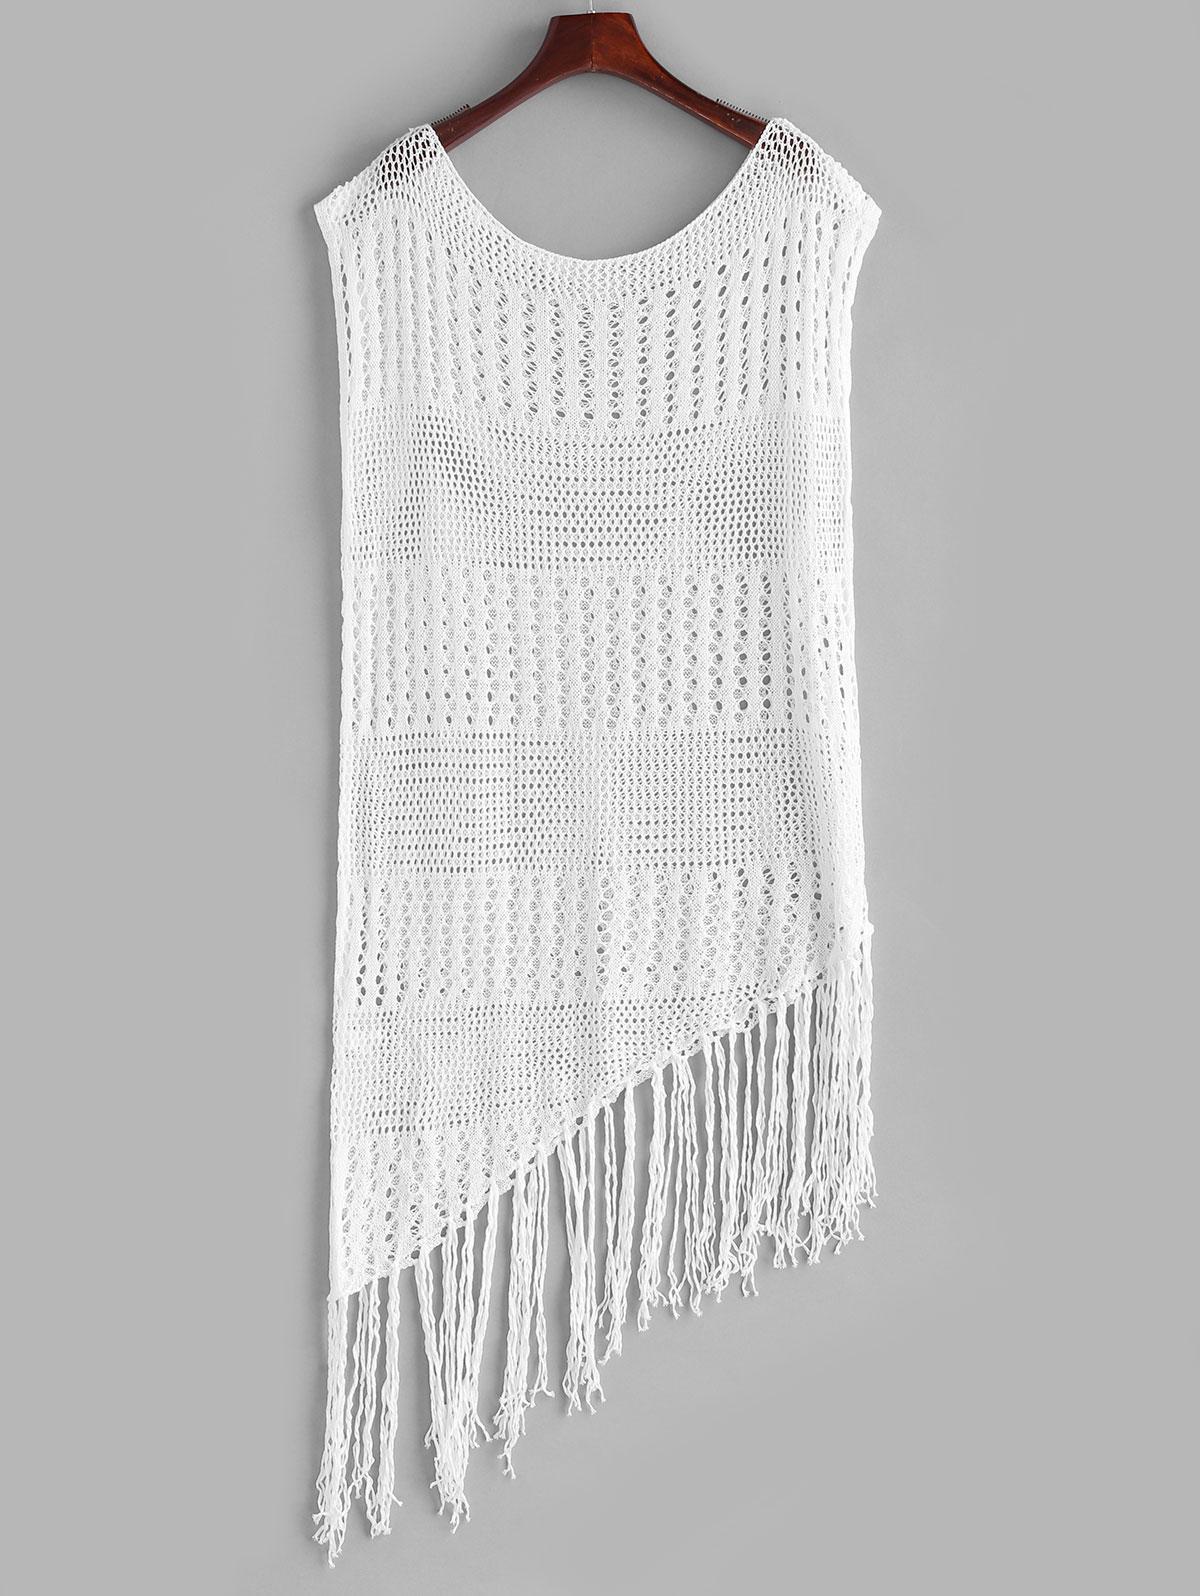 Asymmetrical Crochet Knit Tasseled Cover Up Dress